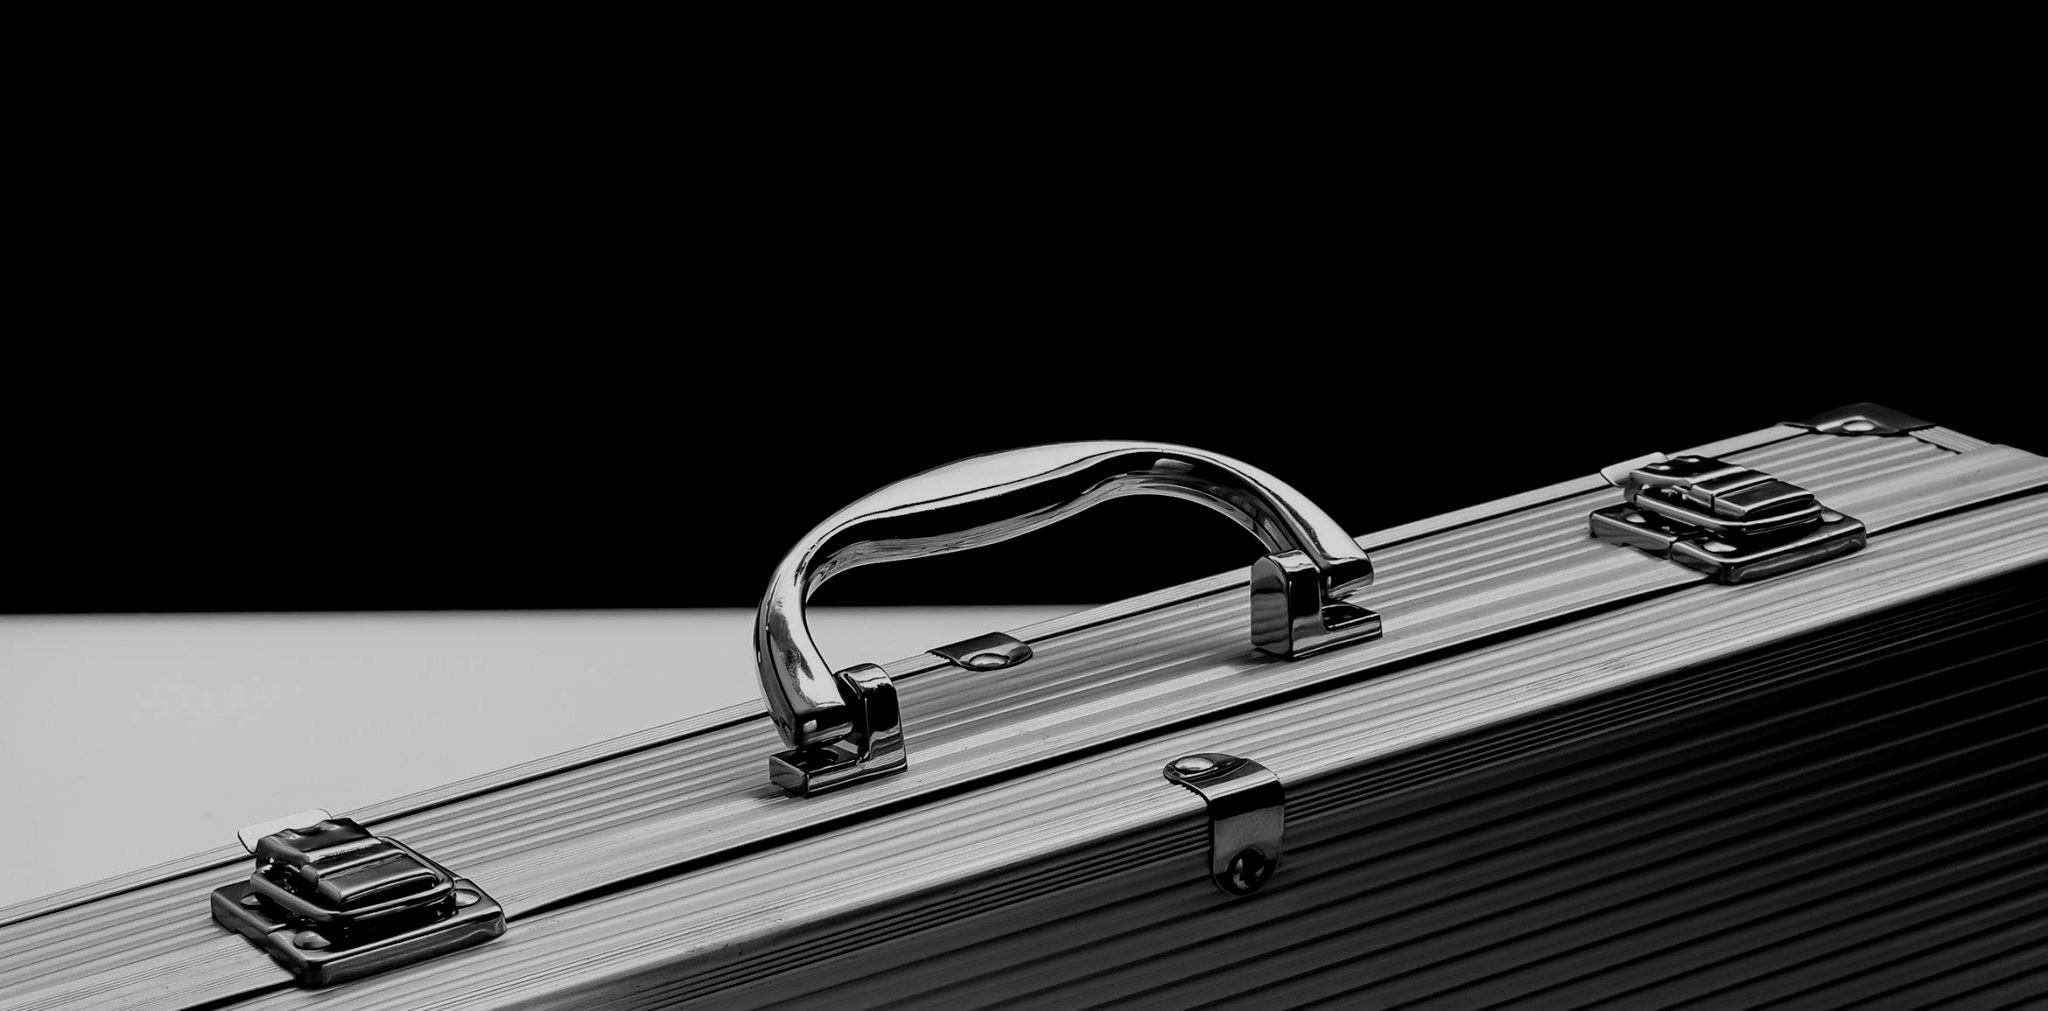 Airtight Cybersecurity in an SAP Landscape